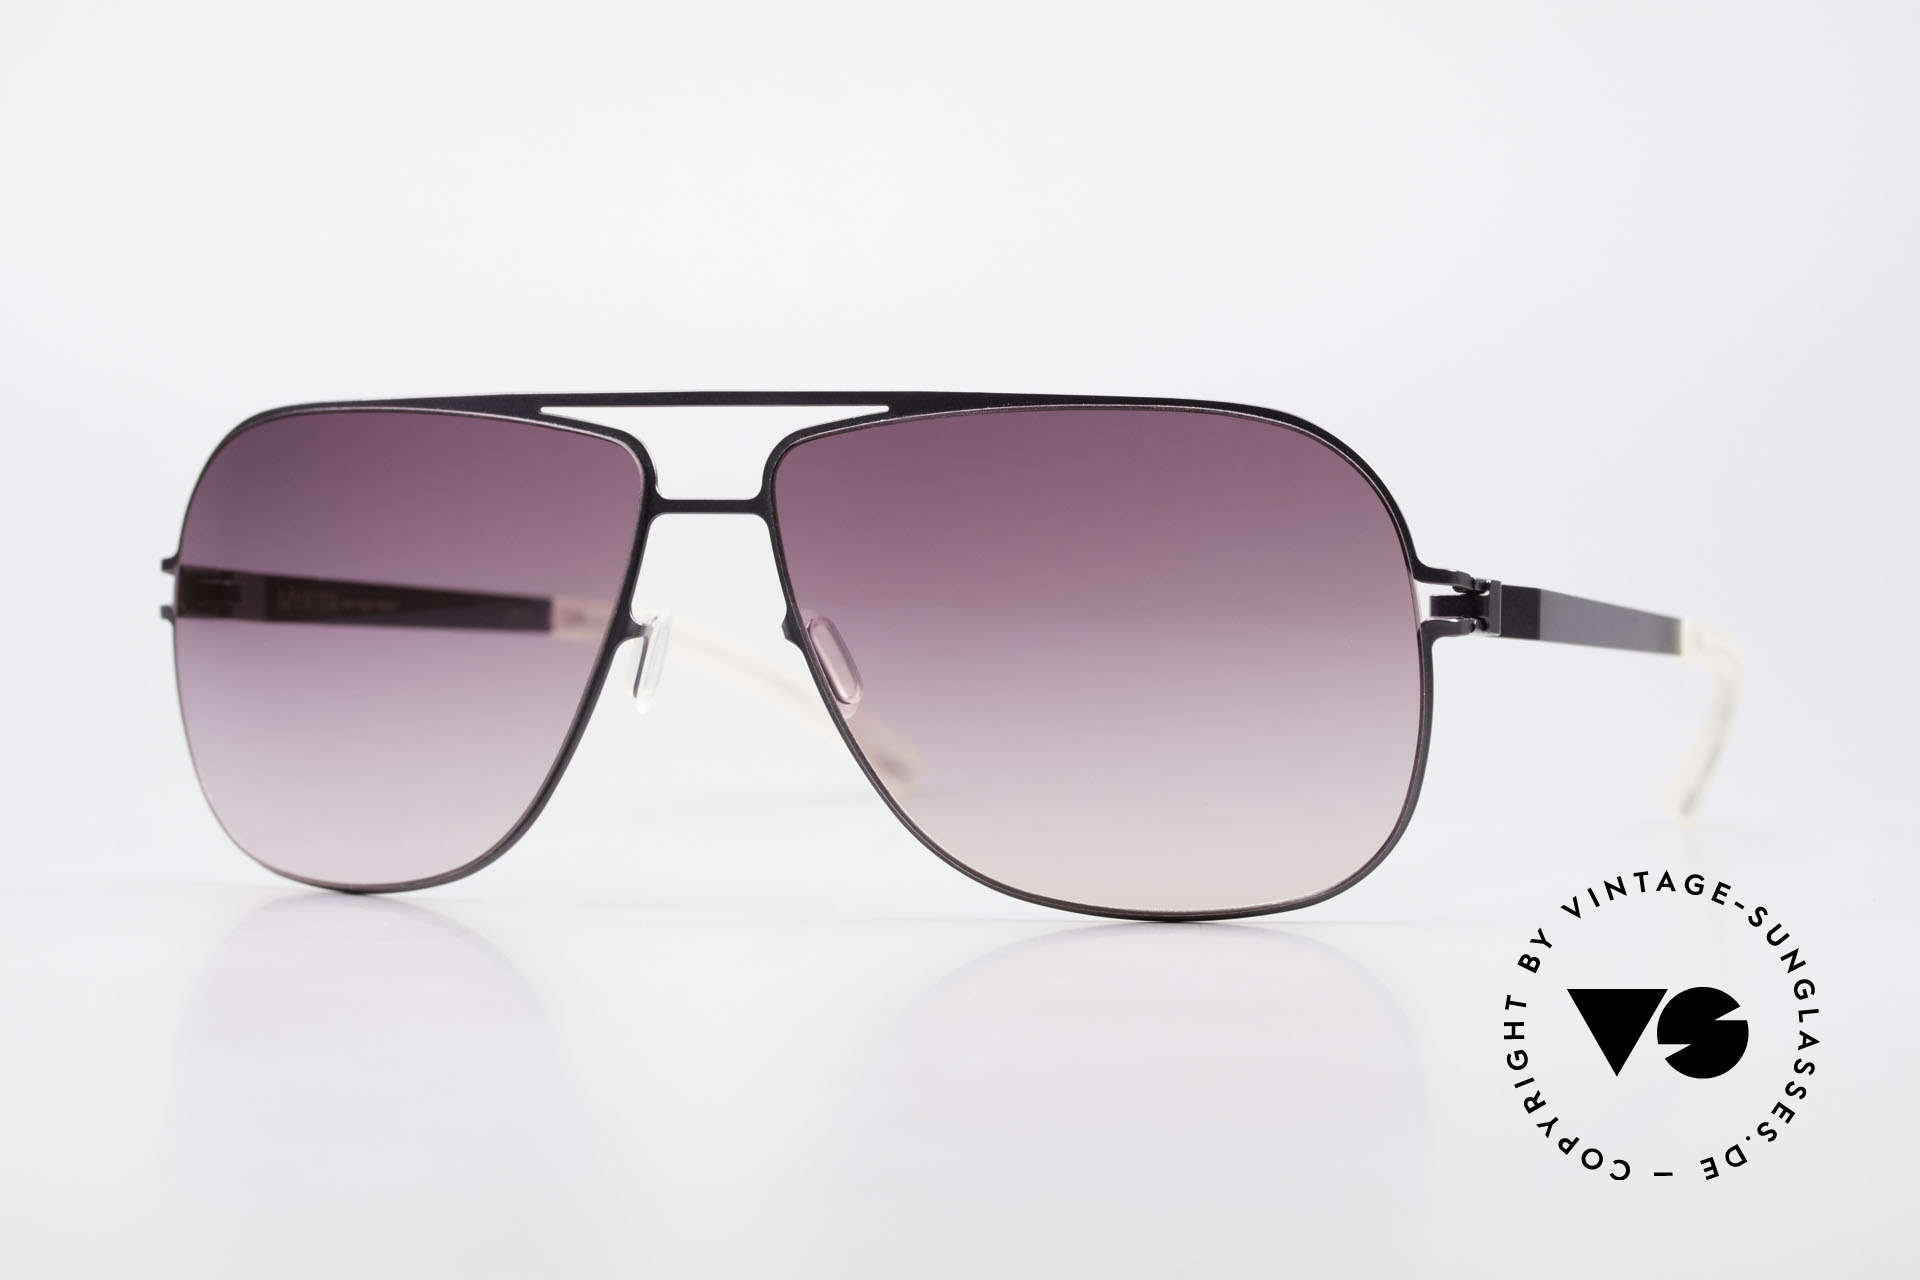 Mykita Rolf Angelina Jolie Mykita Shades, VINTAGE Angelina Jolie Mykita sunglasses from 2011, Made for Men and Women